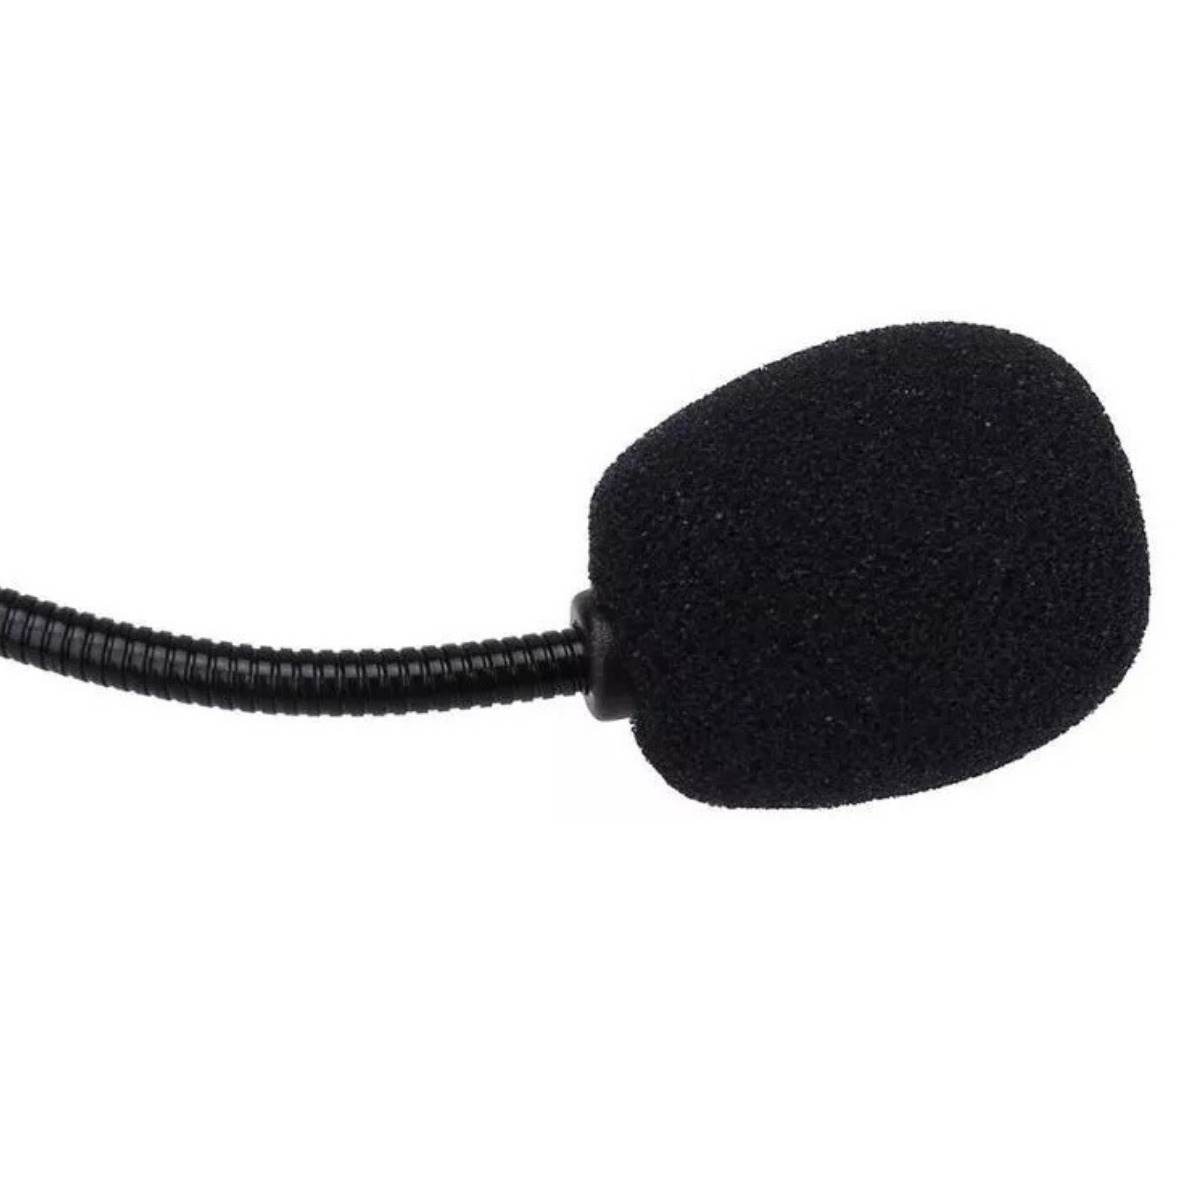 Kit Espuma para microfone lapela ou headset AK027 - 10 Unidades  - Casa do Roadie